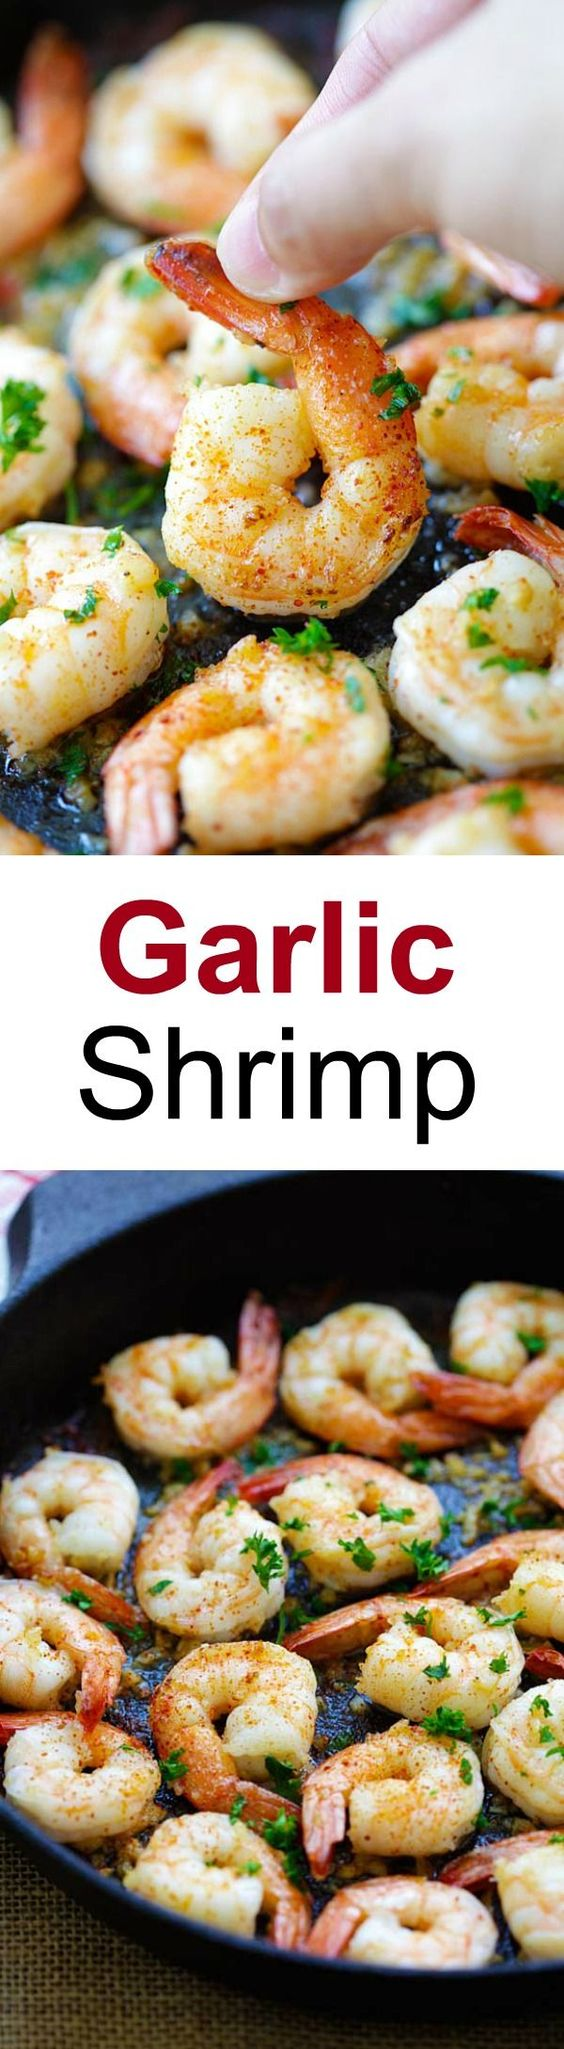 Garlic Shrimp - amazing sauteed shrimp with garlic, butter, lemon ...